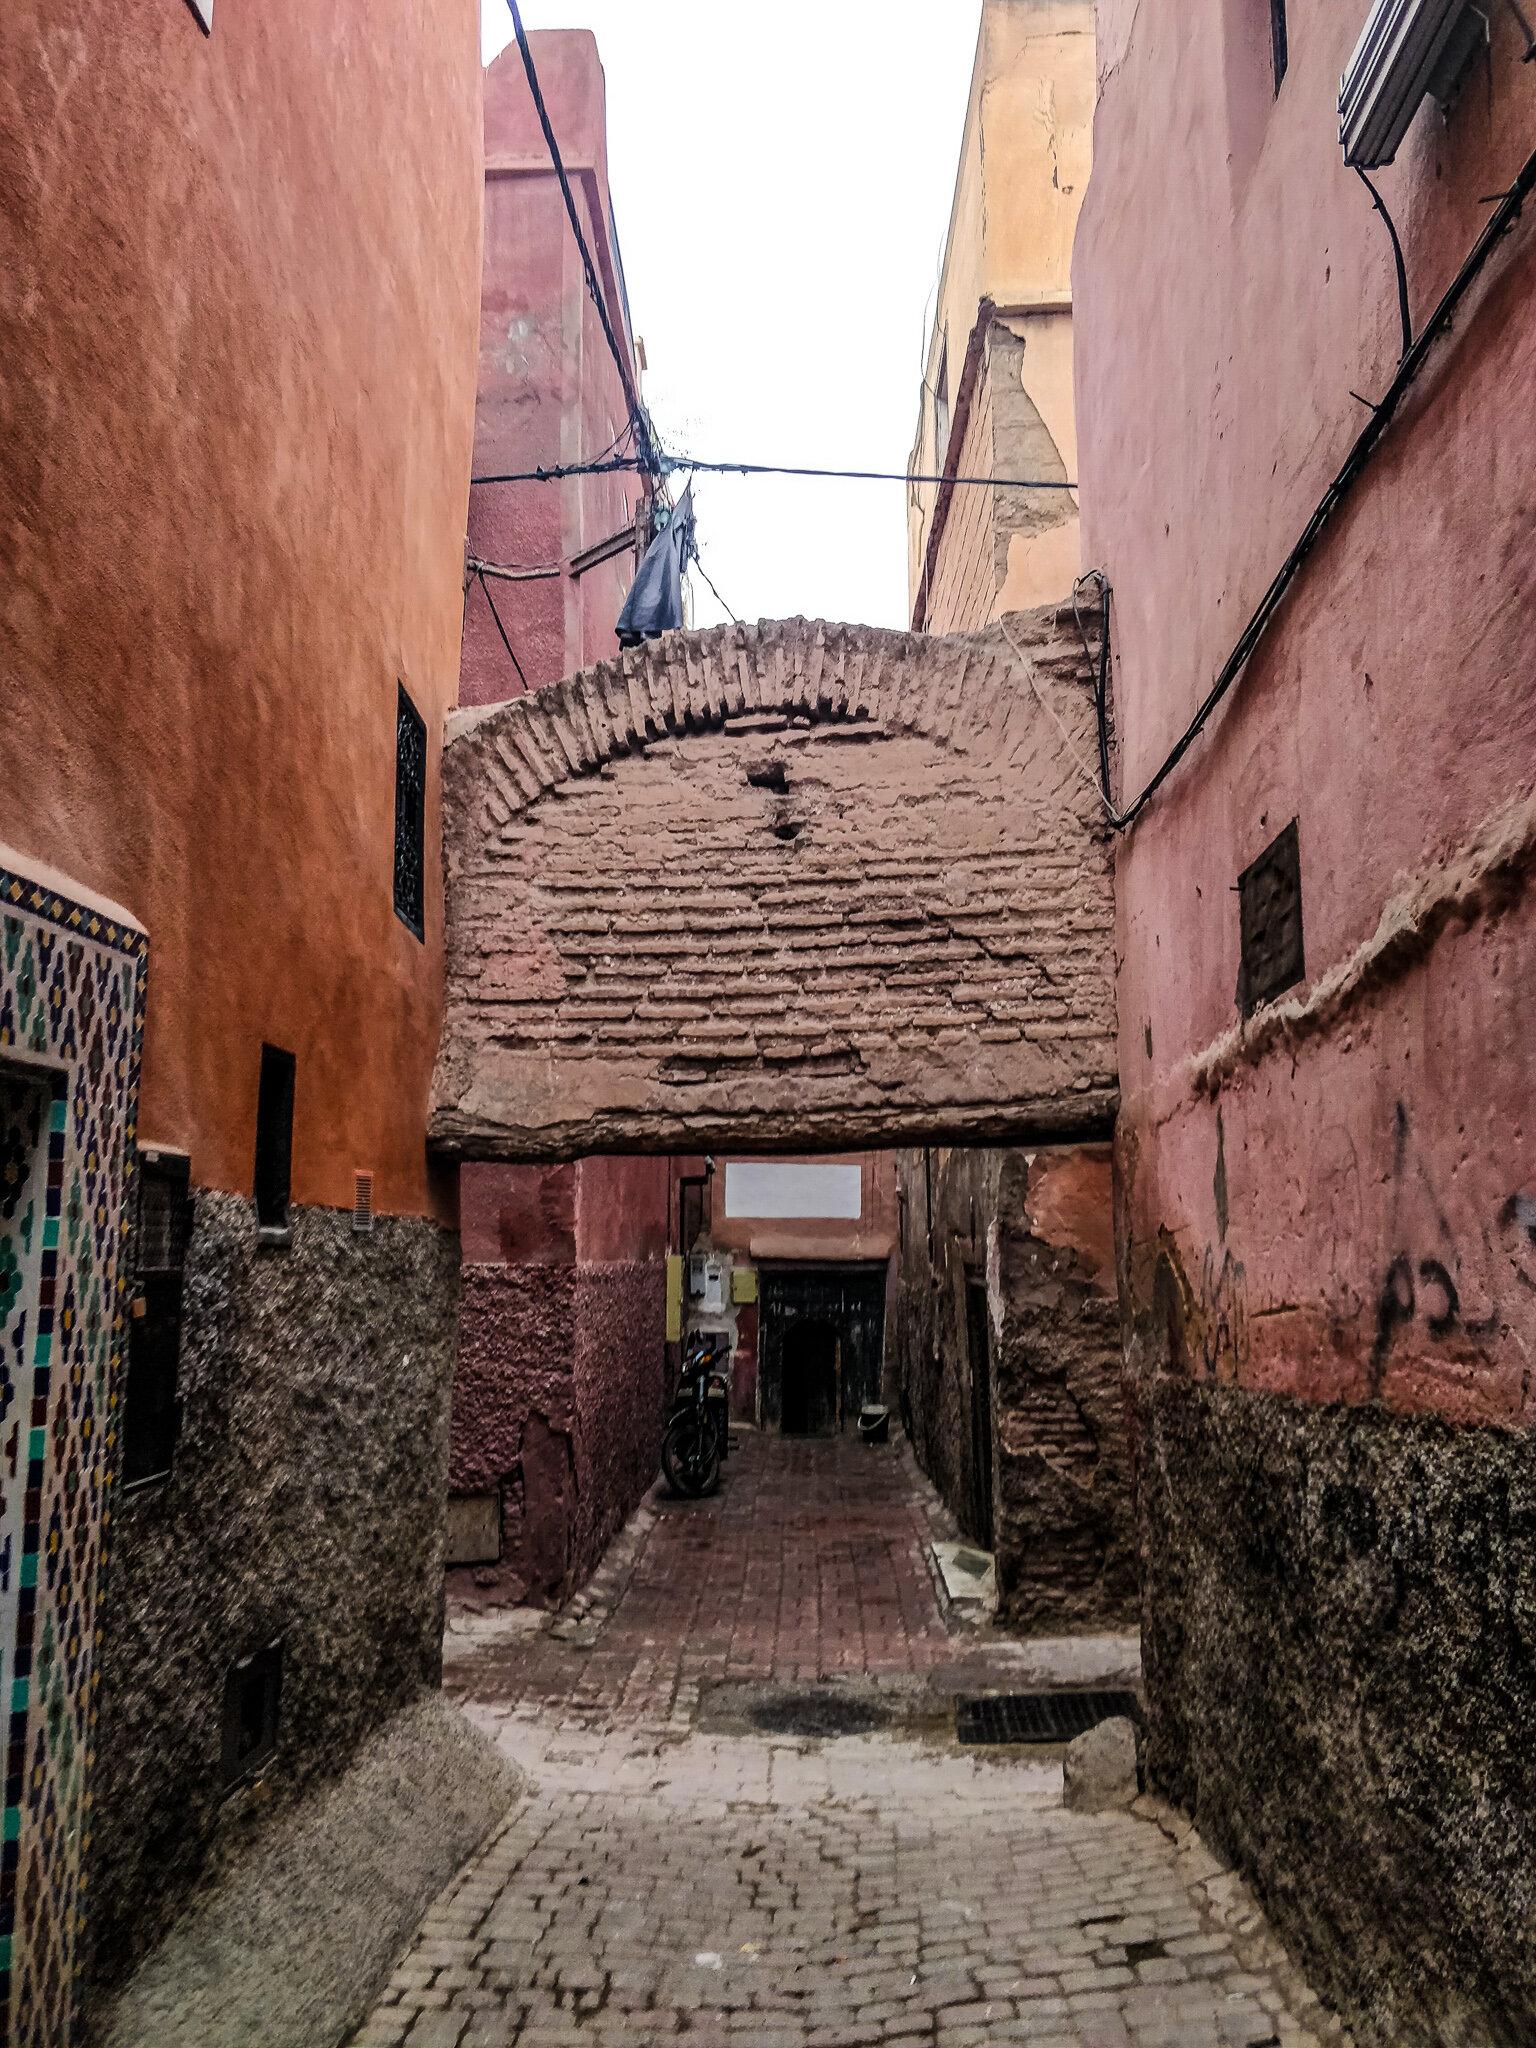 Intalnirea omului Marrakech. Intalnirea femeii frumoase